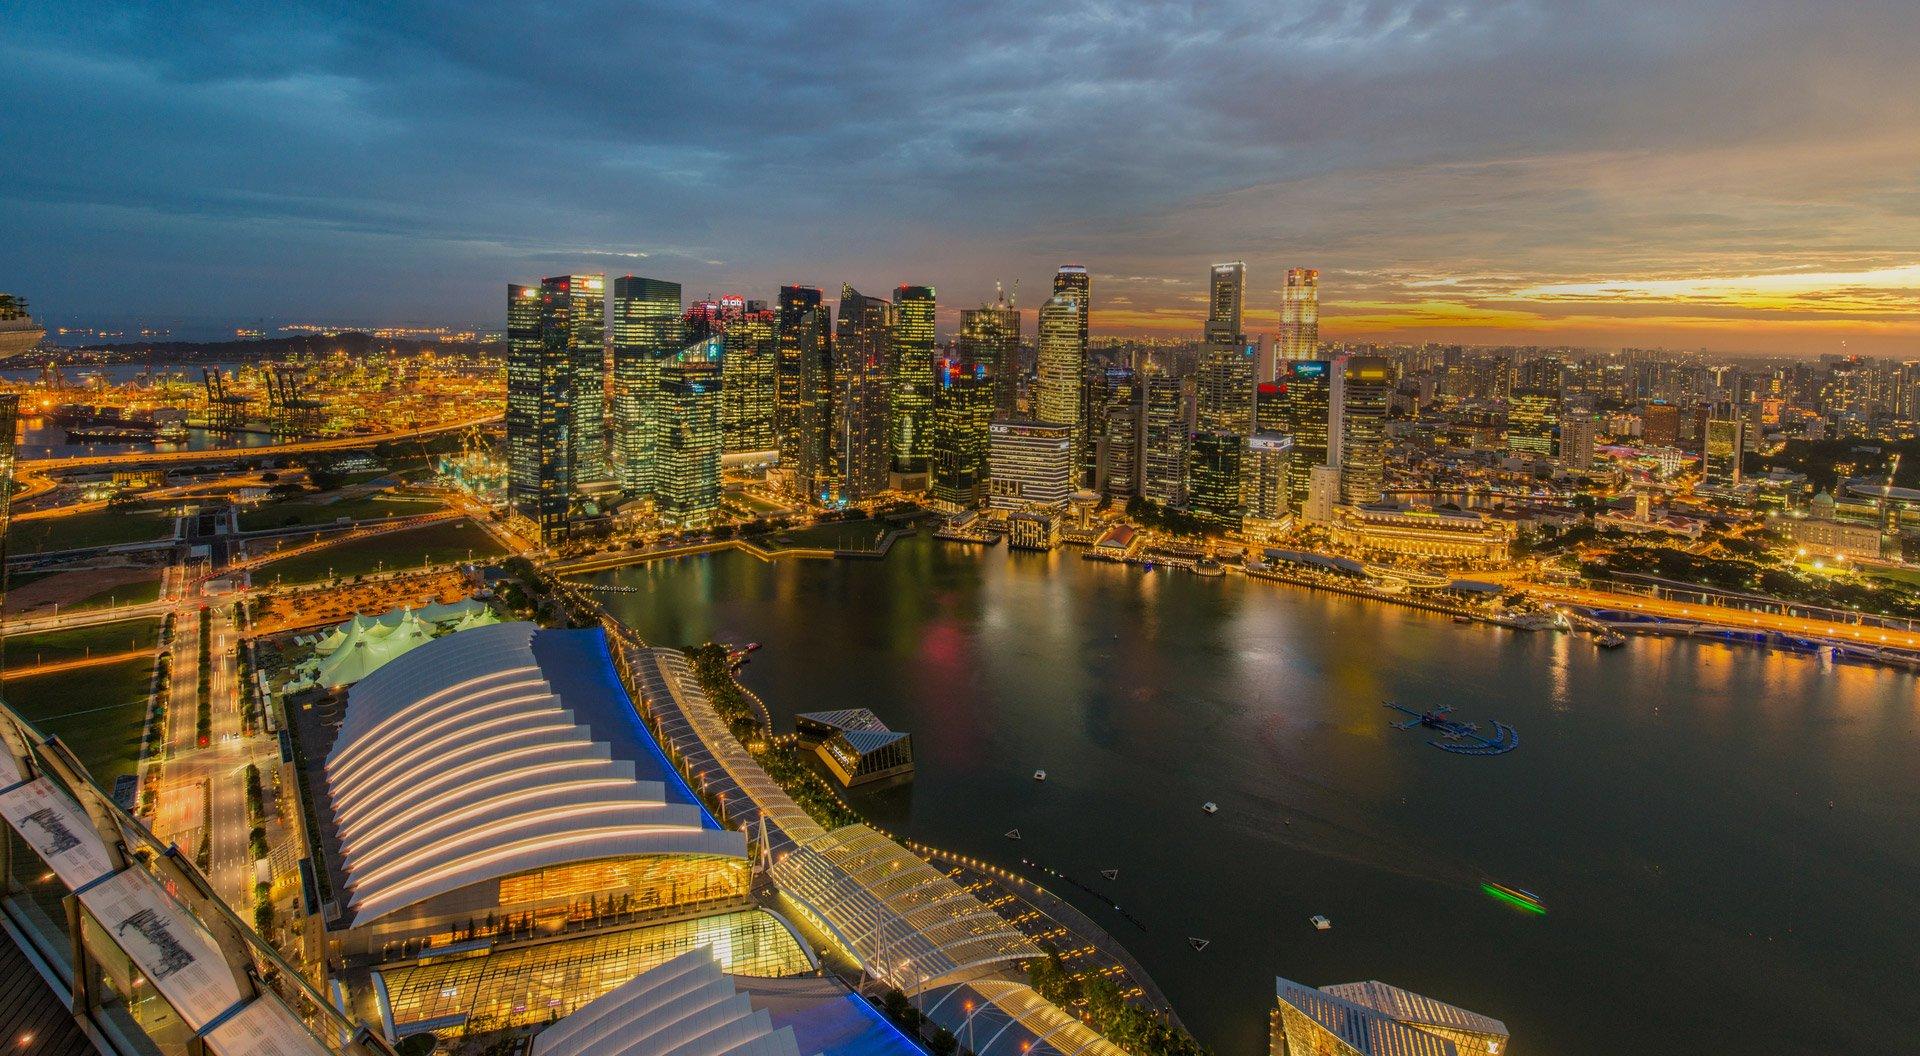 Synergix E1 Enterprise Resource Planning (ERP) System - Singapore BG